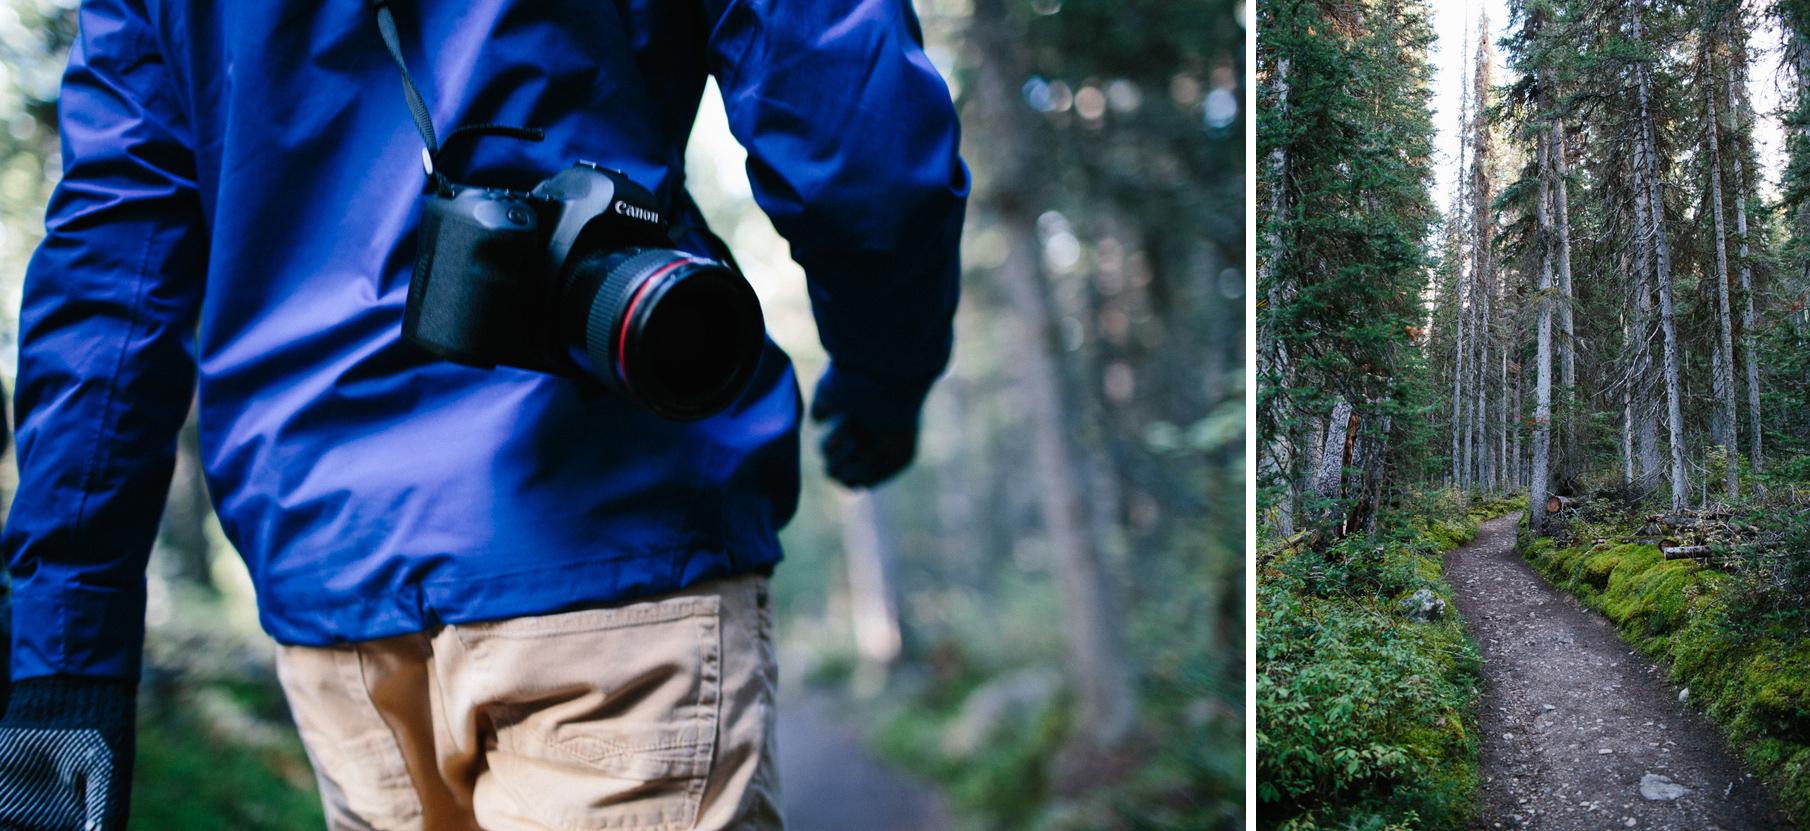 AlbertaCanada-201309-FinnBeales-28.jpg